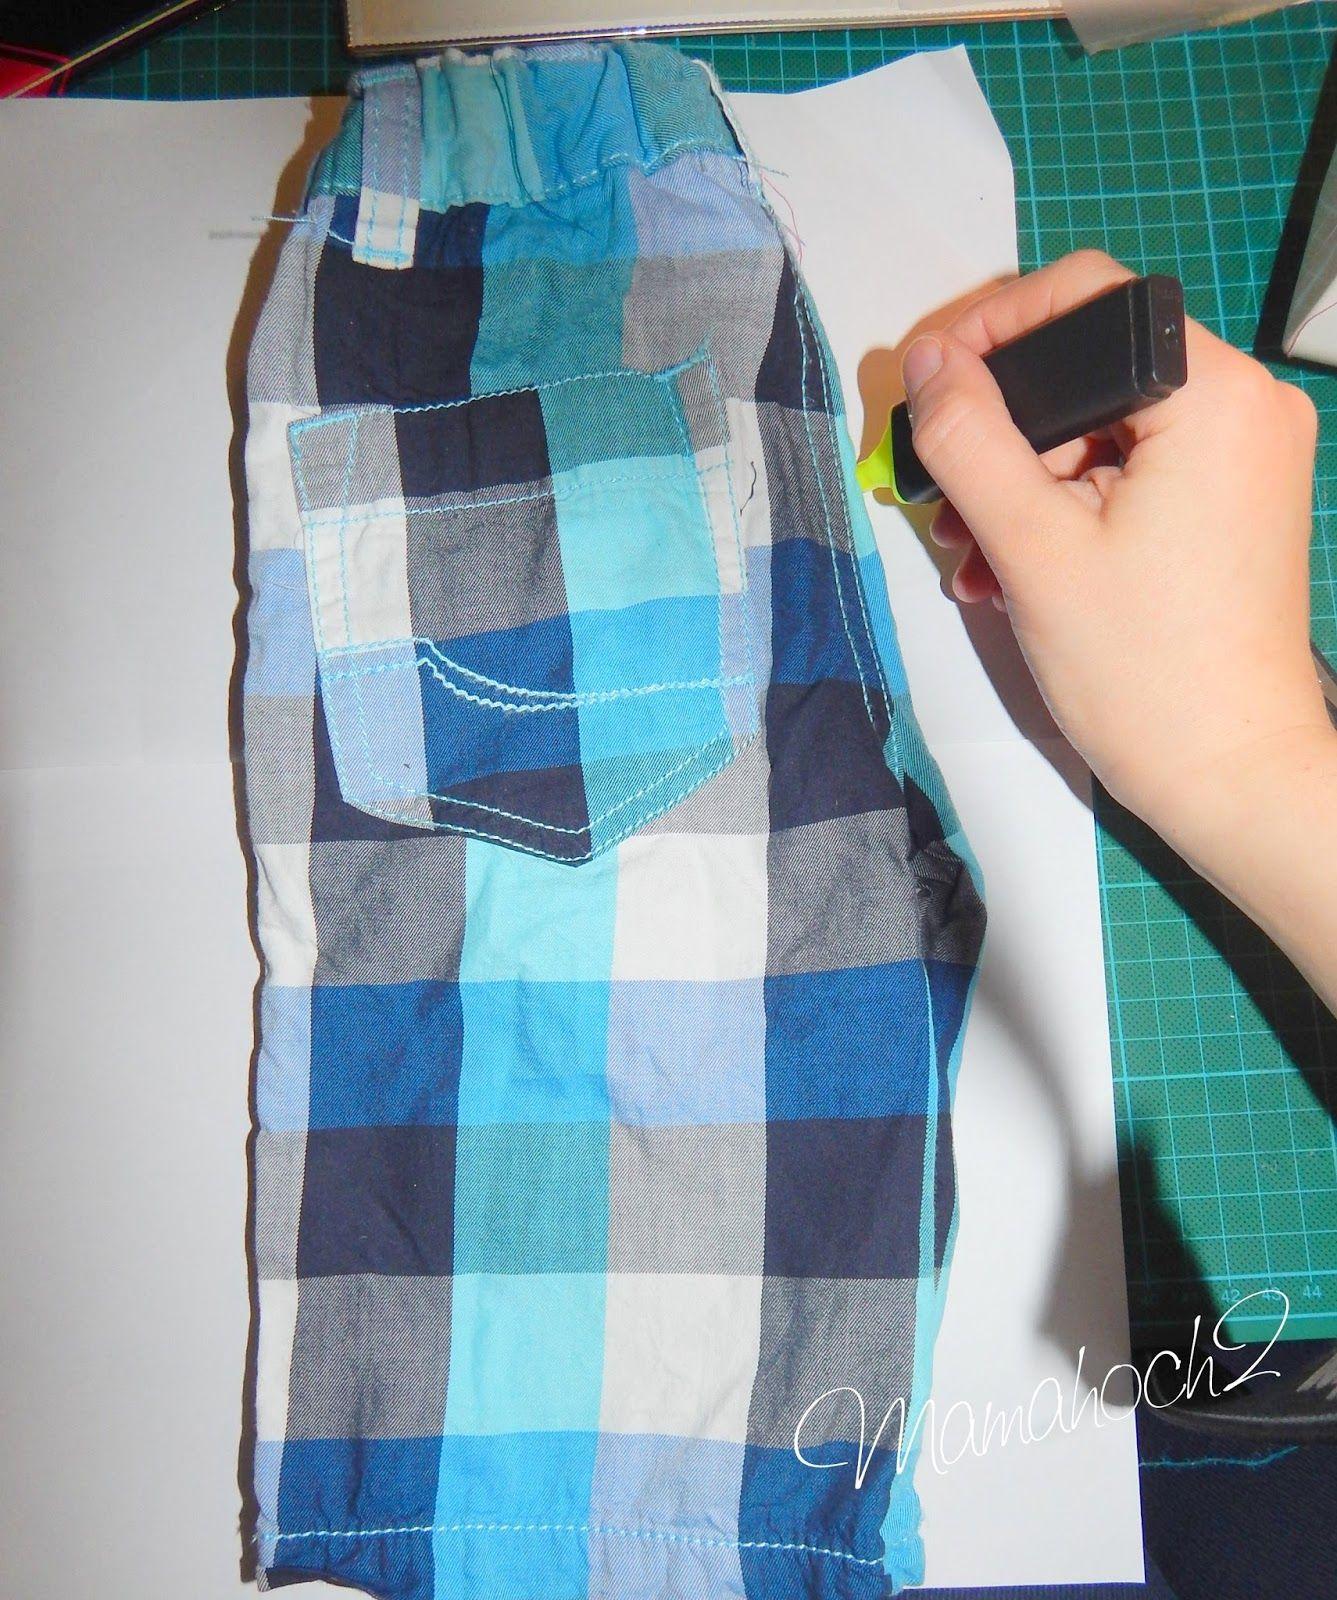 Mamahoch2: Kurze Hose mit eigenem Schnittmuster nähen | Handarbeiten ...